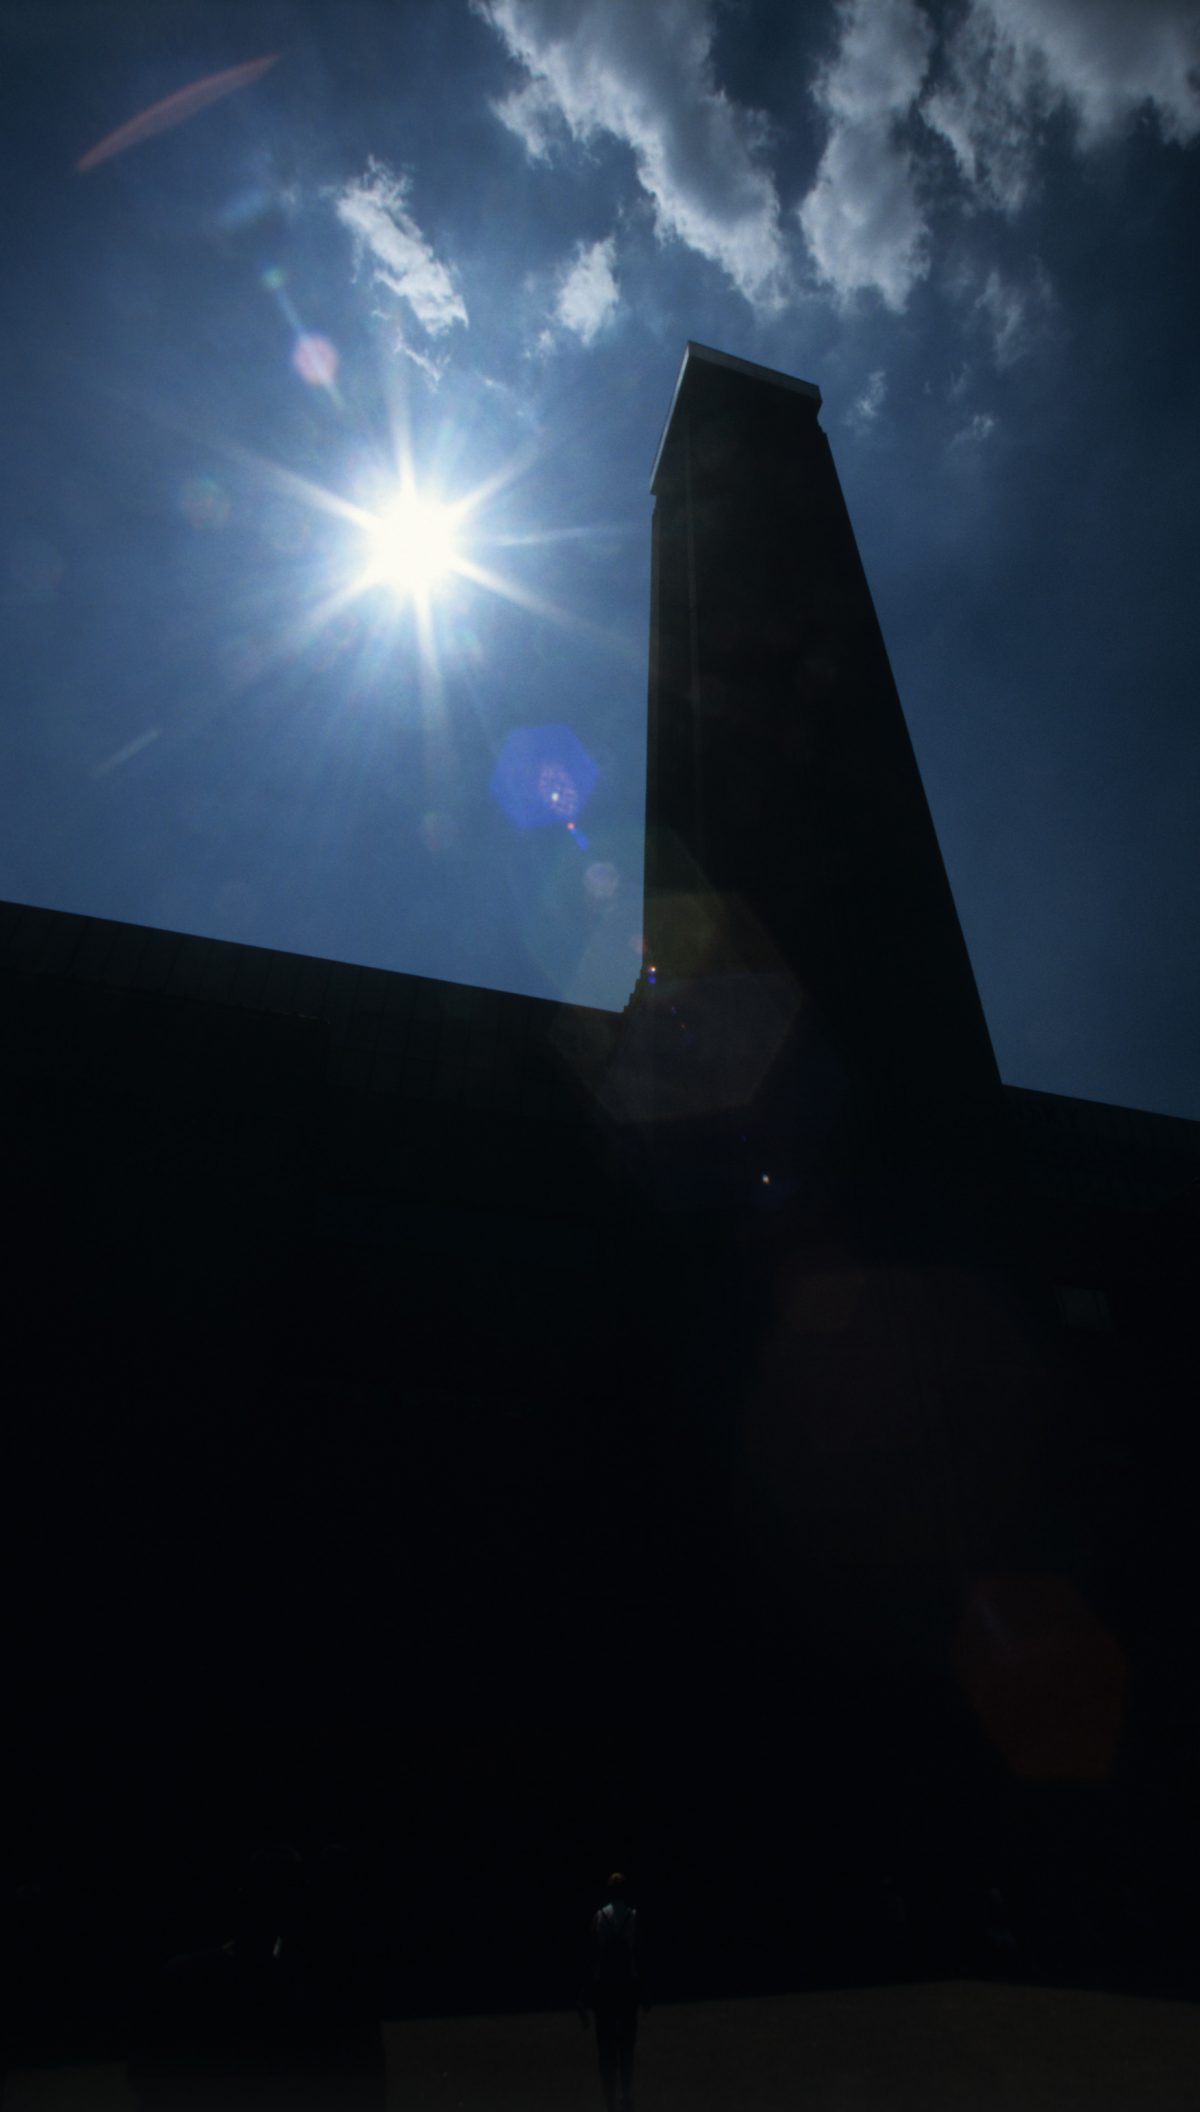 chimney, sky, sun, building, contrast, constrast